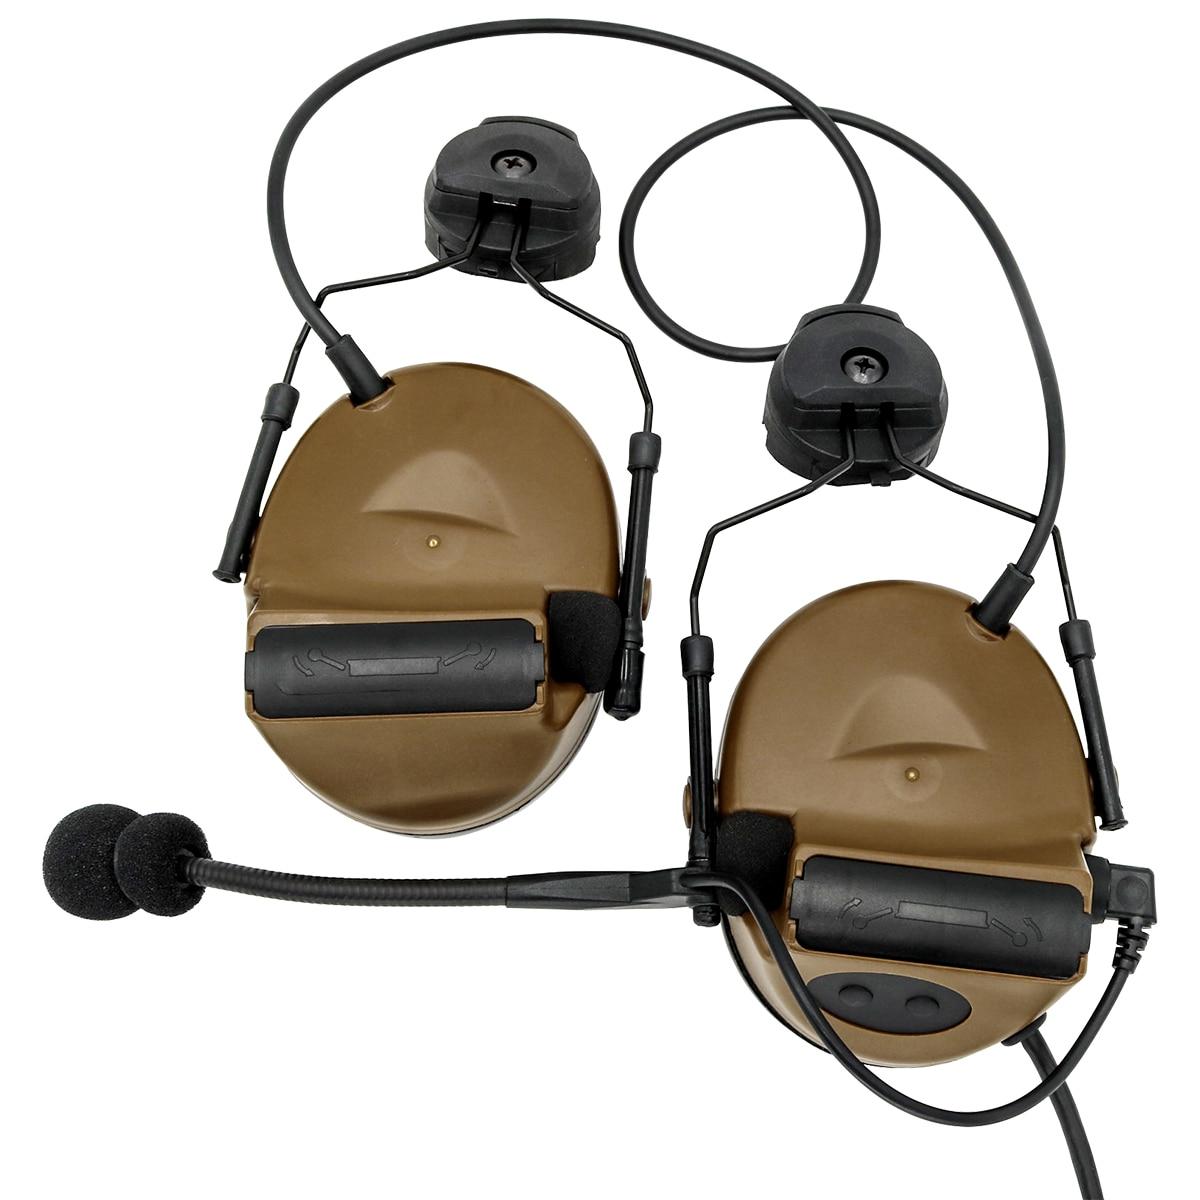 COMTAC II Helmet Bracket Version Headphones Pickup Noise Reduction Hearing Protection Tactical Headset CB +U94 kenwood 2 pin ptt enlarge